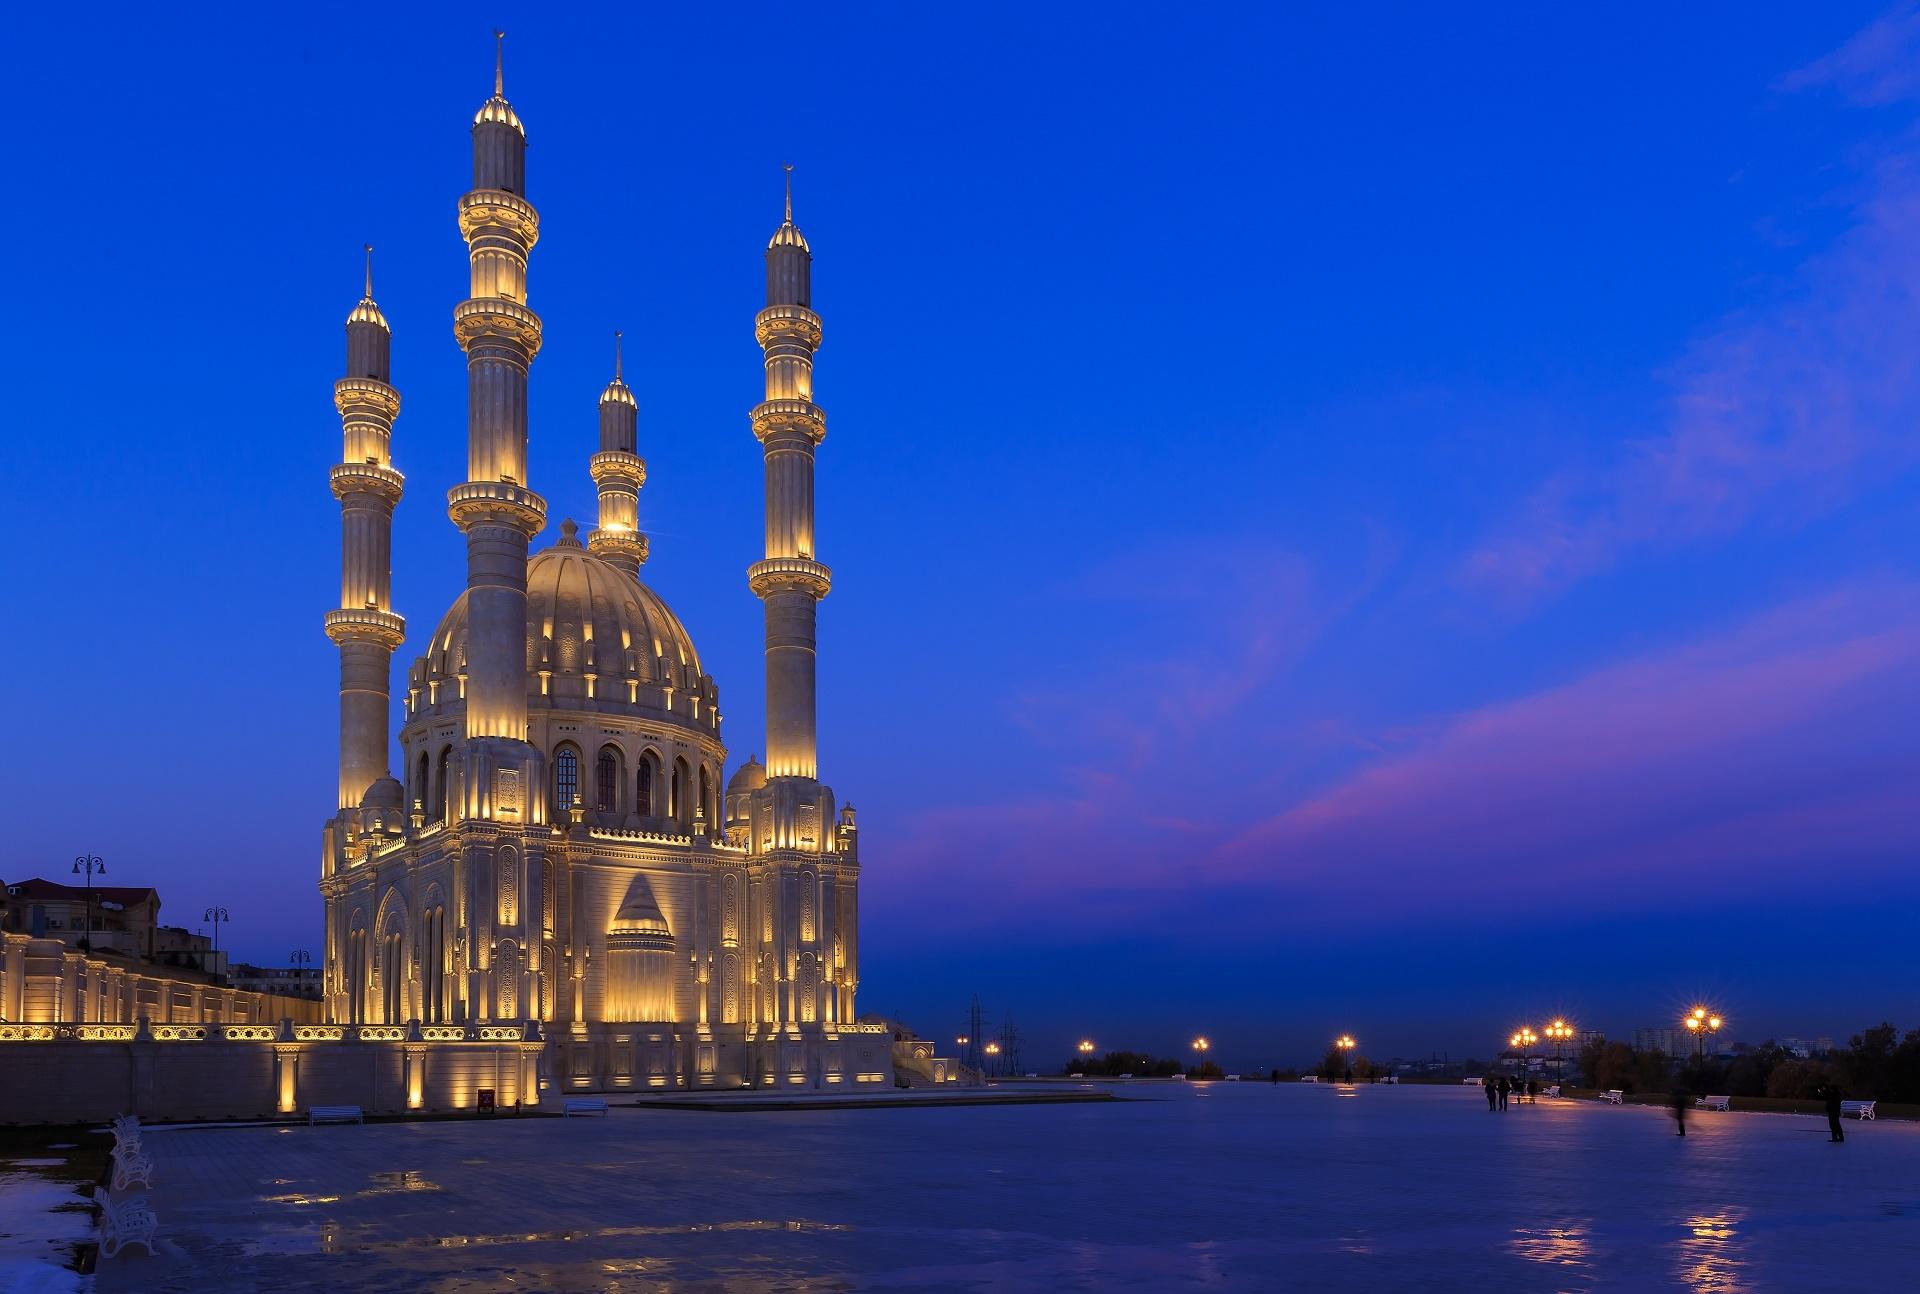 Download 1920x1294 Heydar Mosque Azerbaijan Baku Lights Night 1920x1294